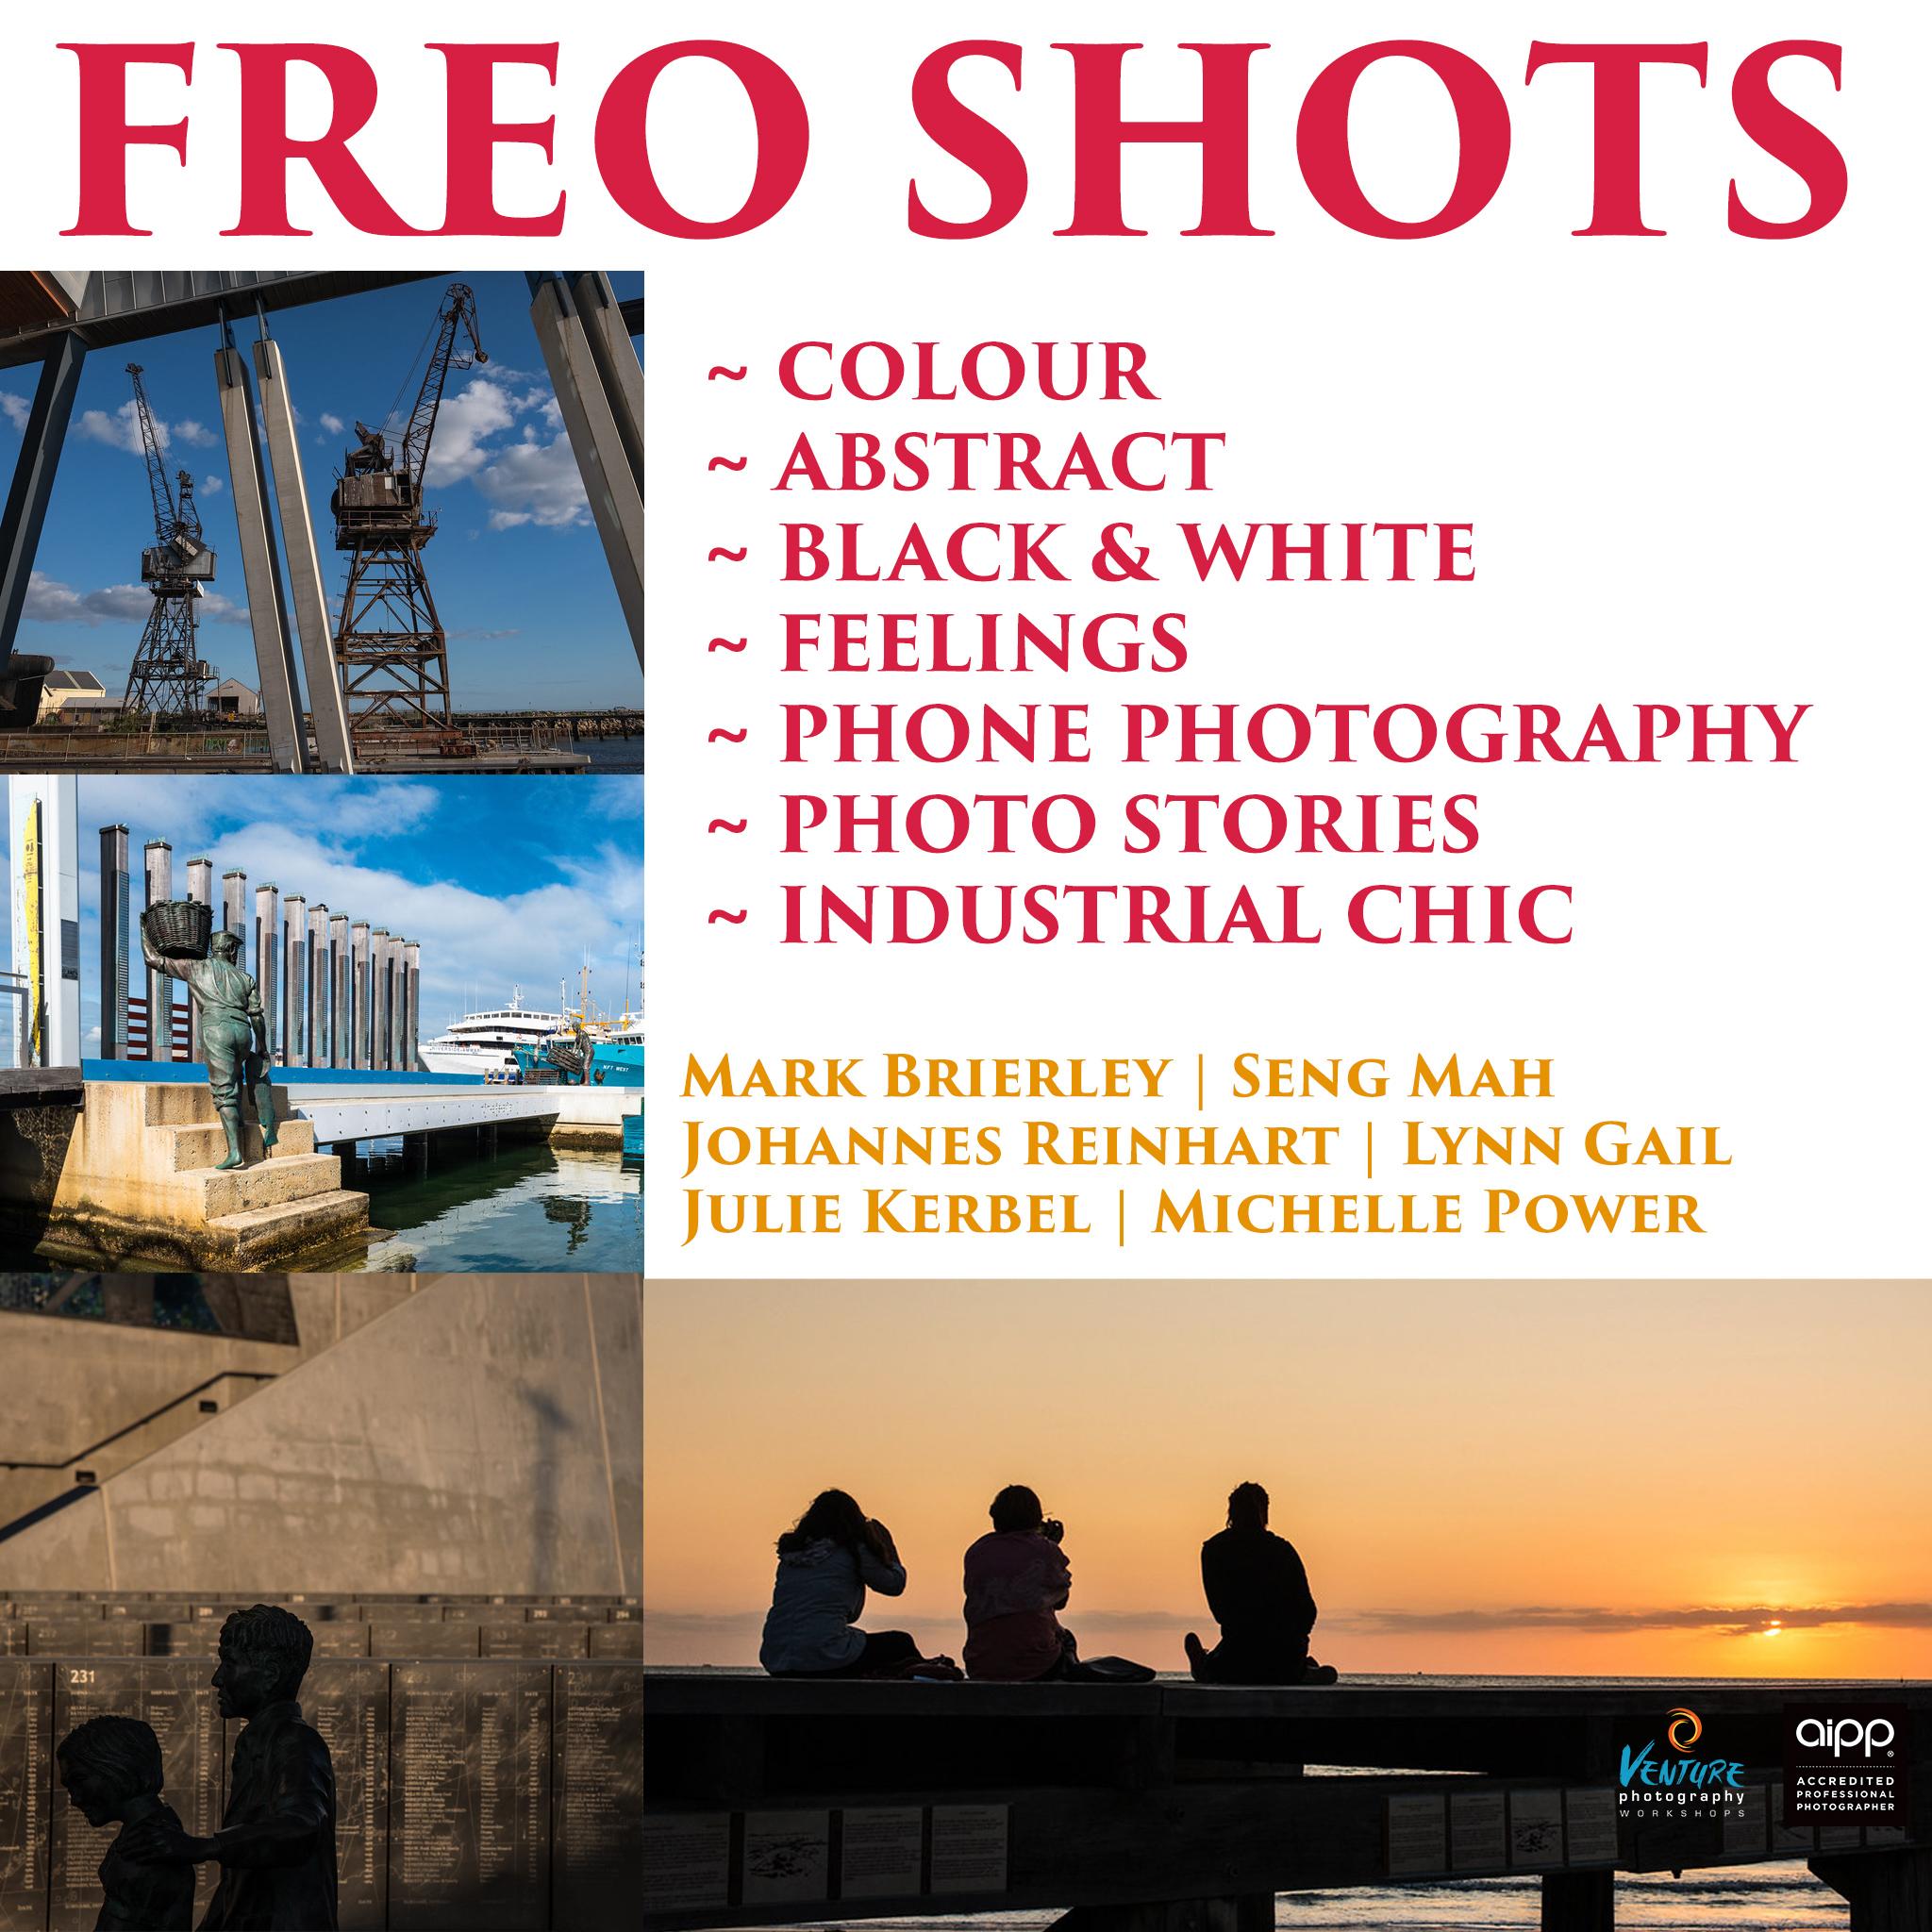 Freo Shots